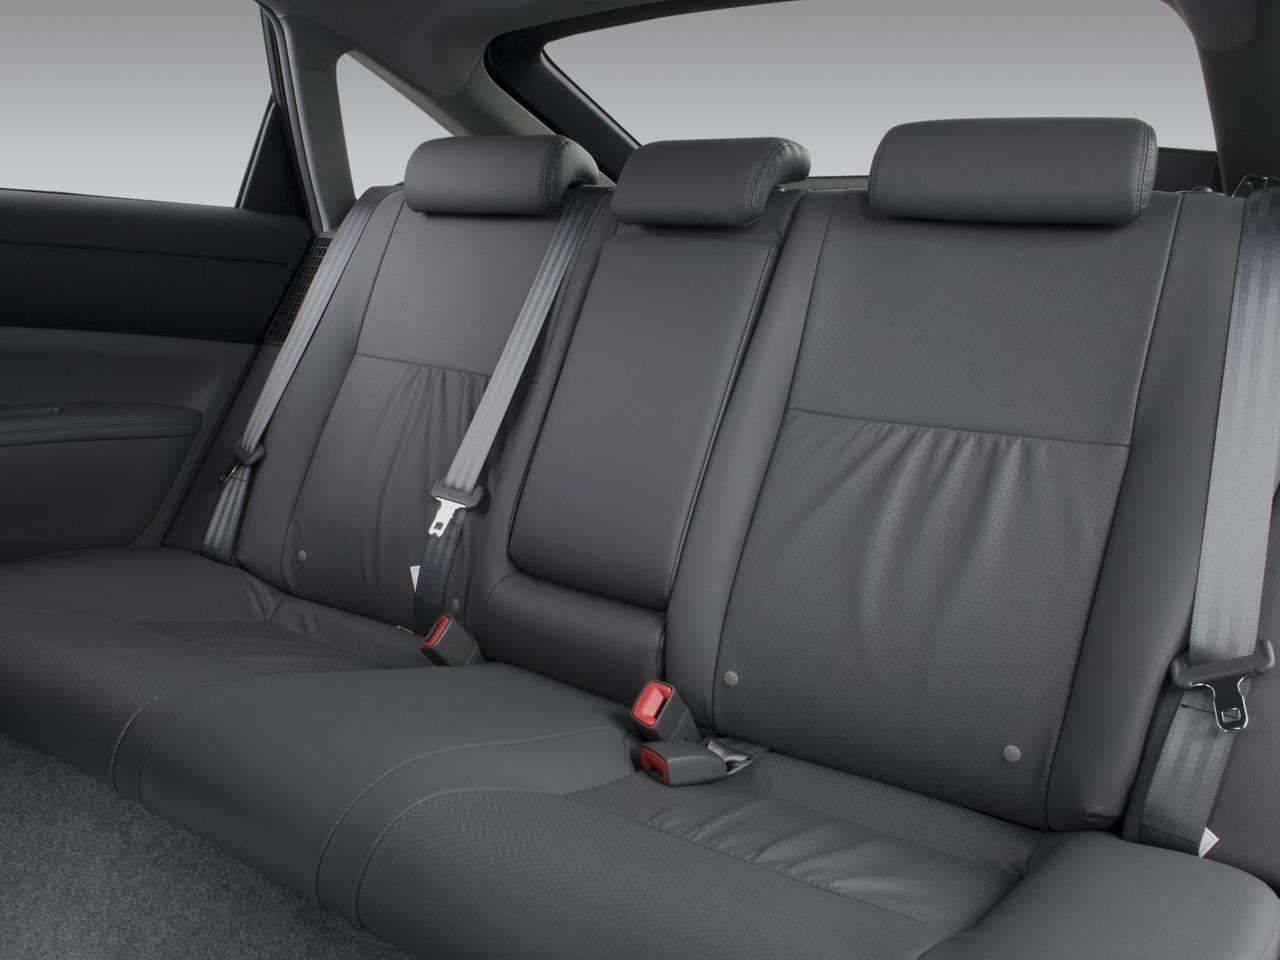 2008 Toyota Prius Touring Edition Hybrid Sedan Review Interior 34 50